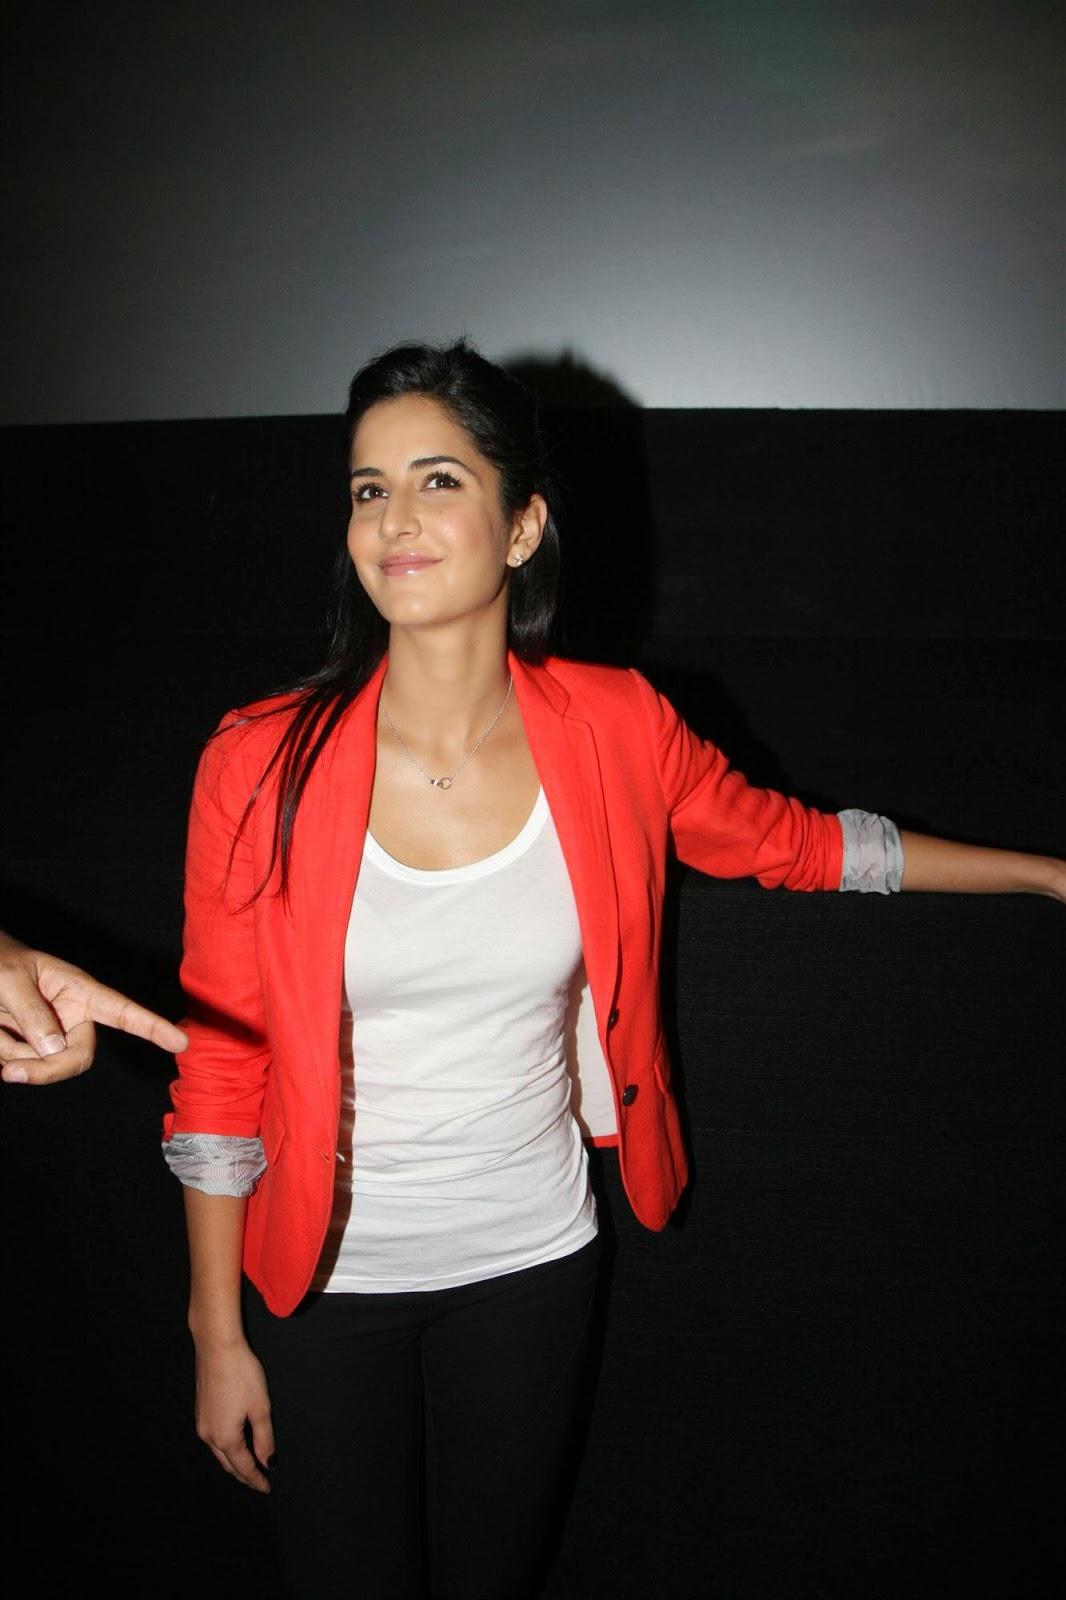 Katrina Kaif Bollywood Actress Images  Katrina Kaif Hd -4704